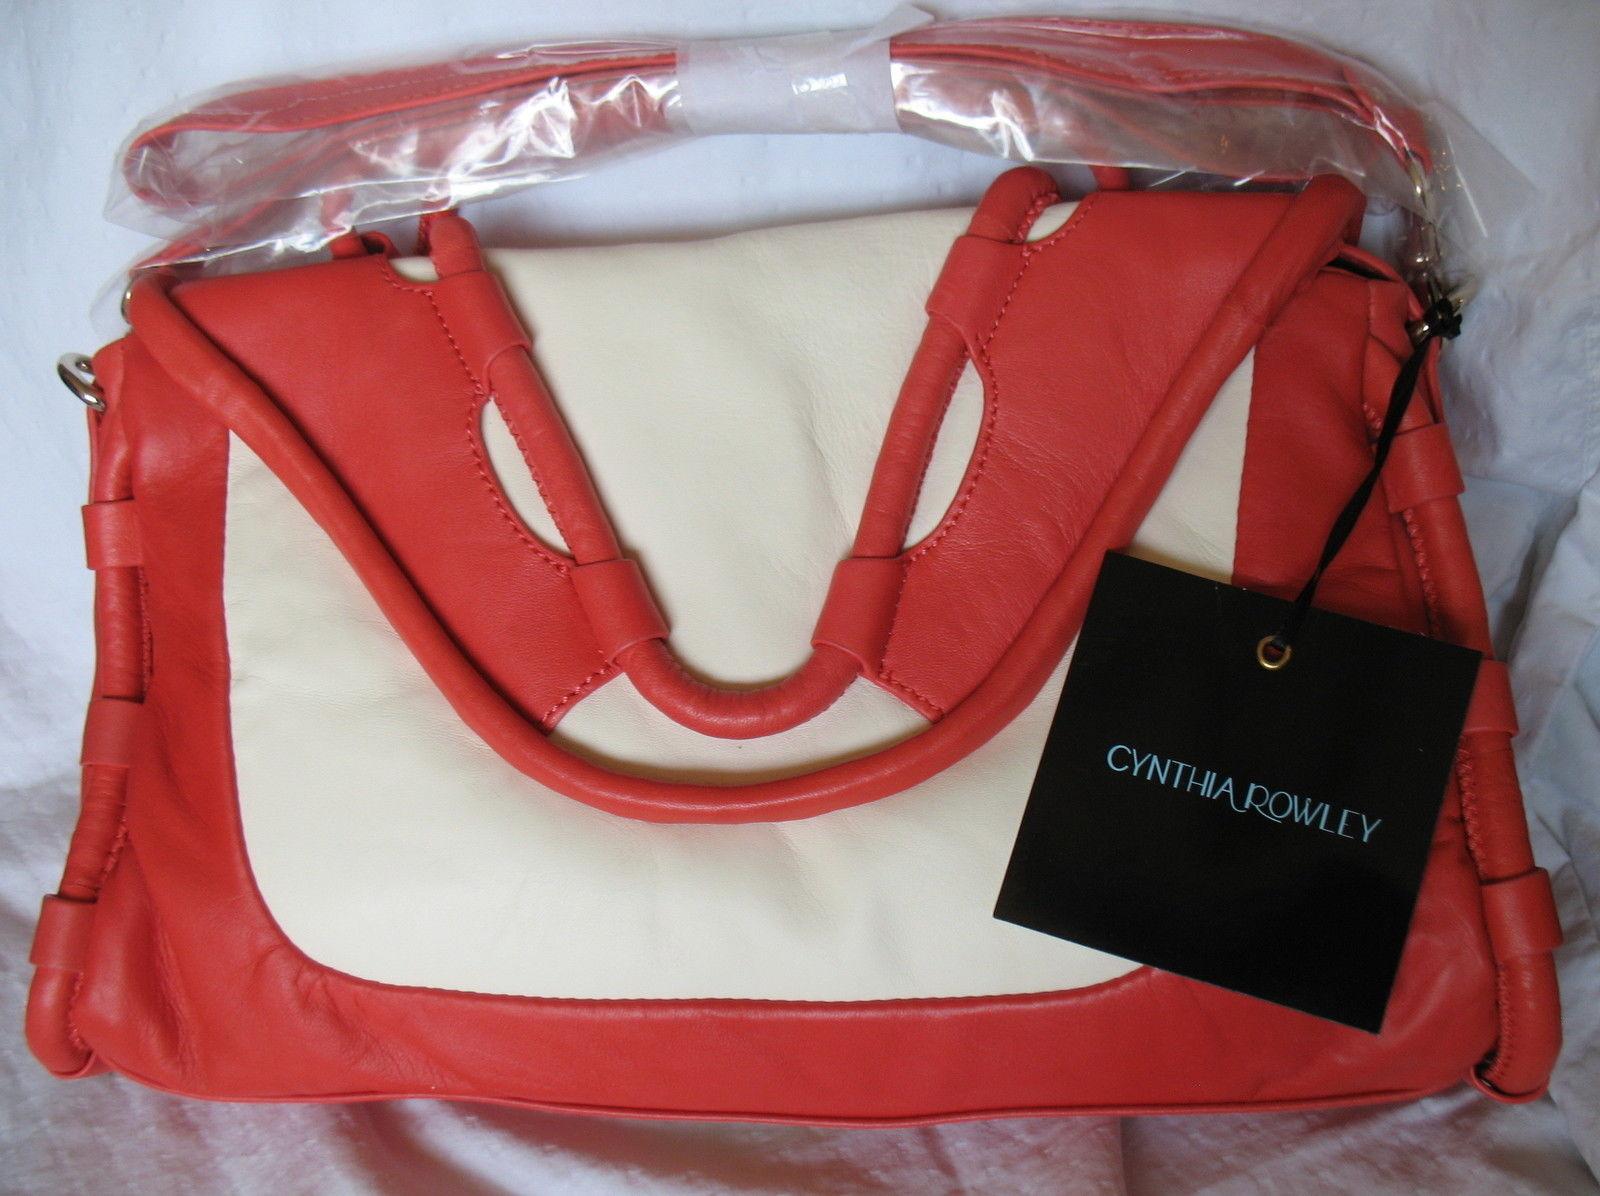 Cynthia Rowley New Purse Handbag Leather Crossbody Calloway Orange Coral White